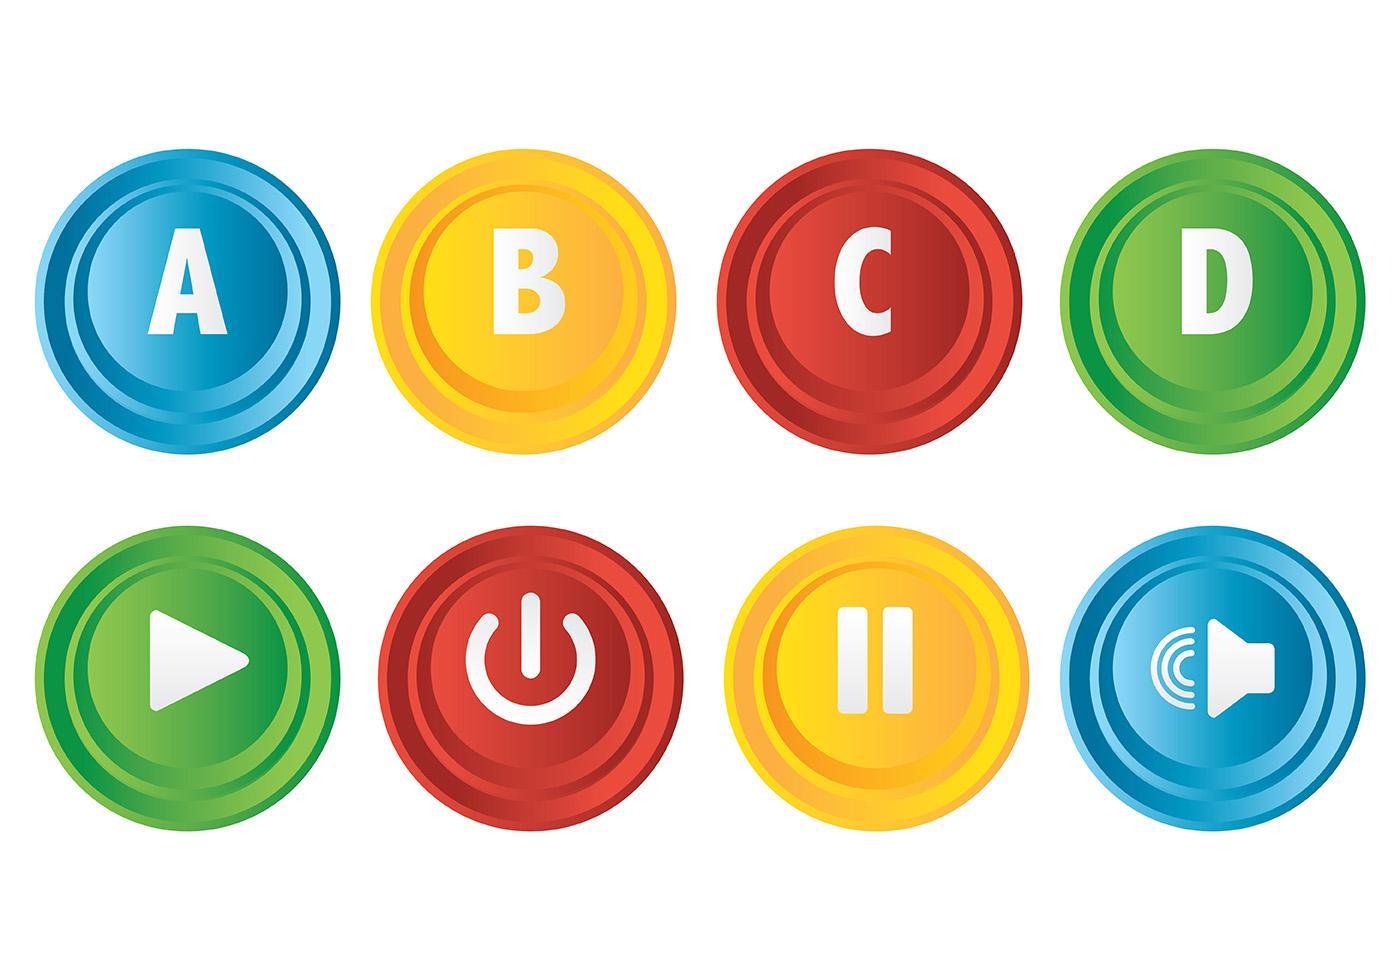 Free Arcade Button Icons Vector - Download Free Vectors ...